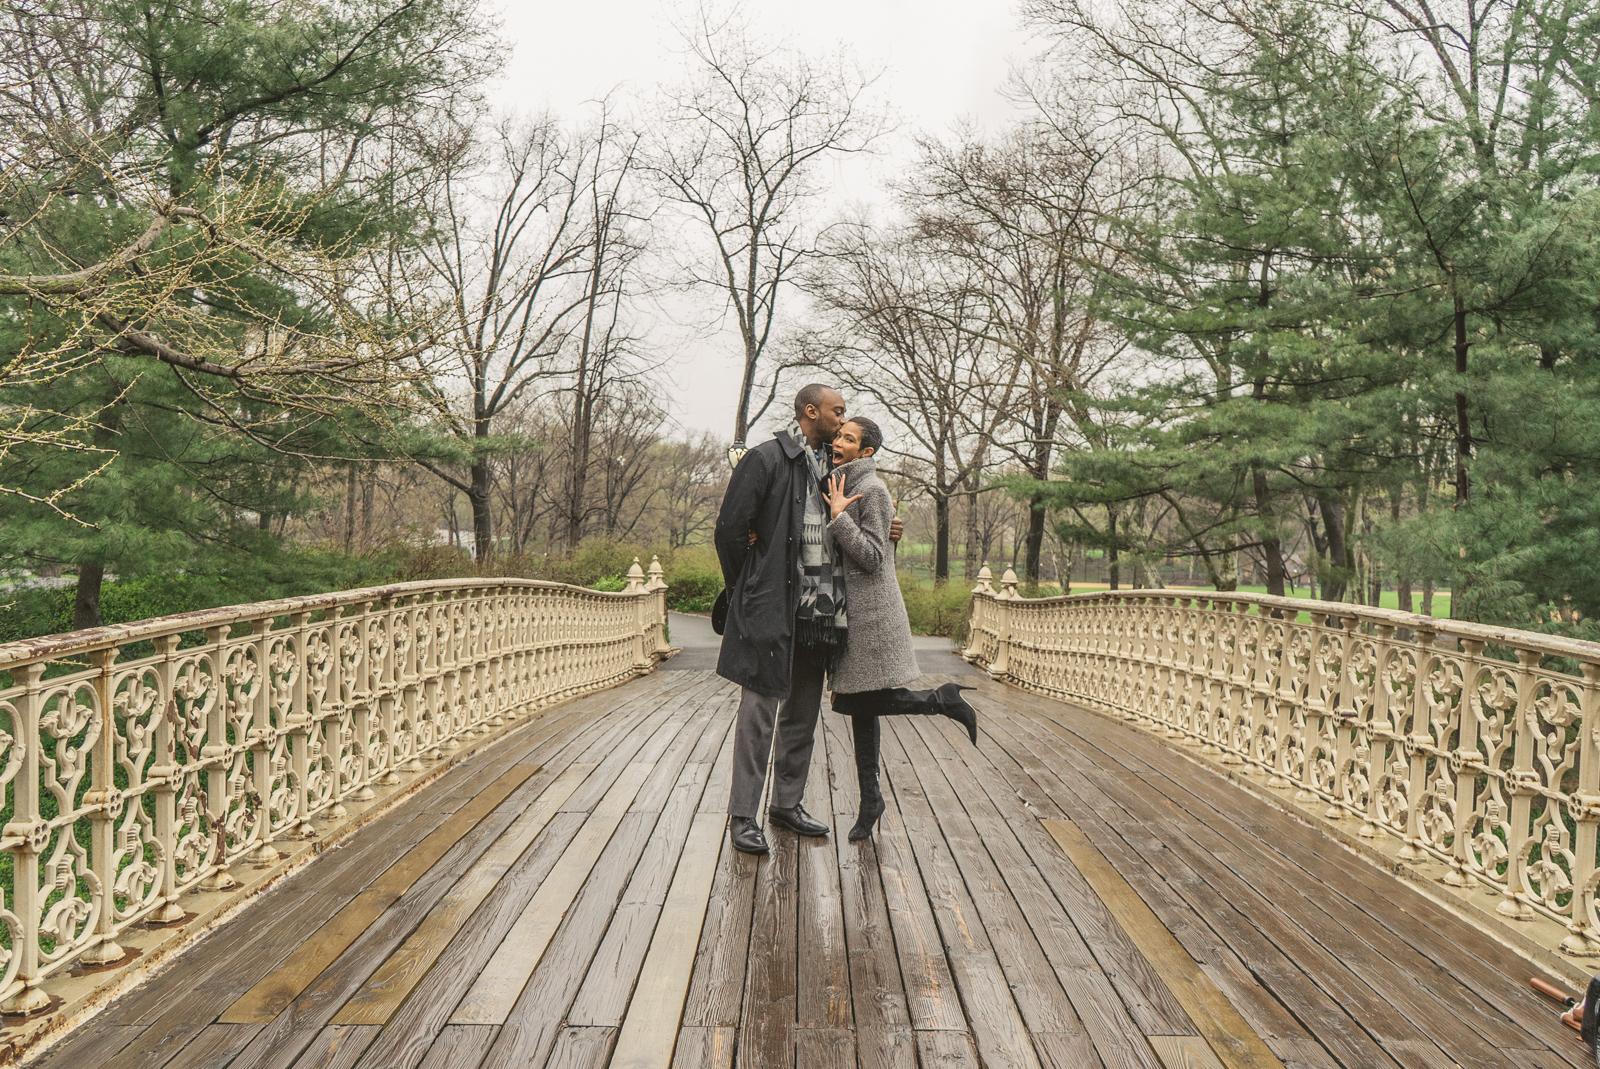 Photo 8 Pine Bank bridge Central Park Marriage Proposal   VladLeto